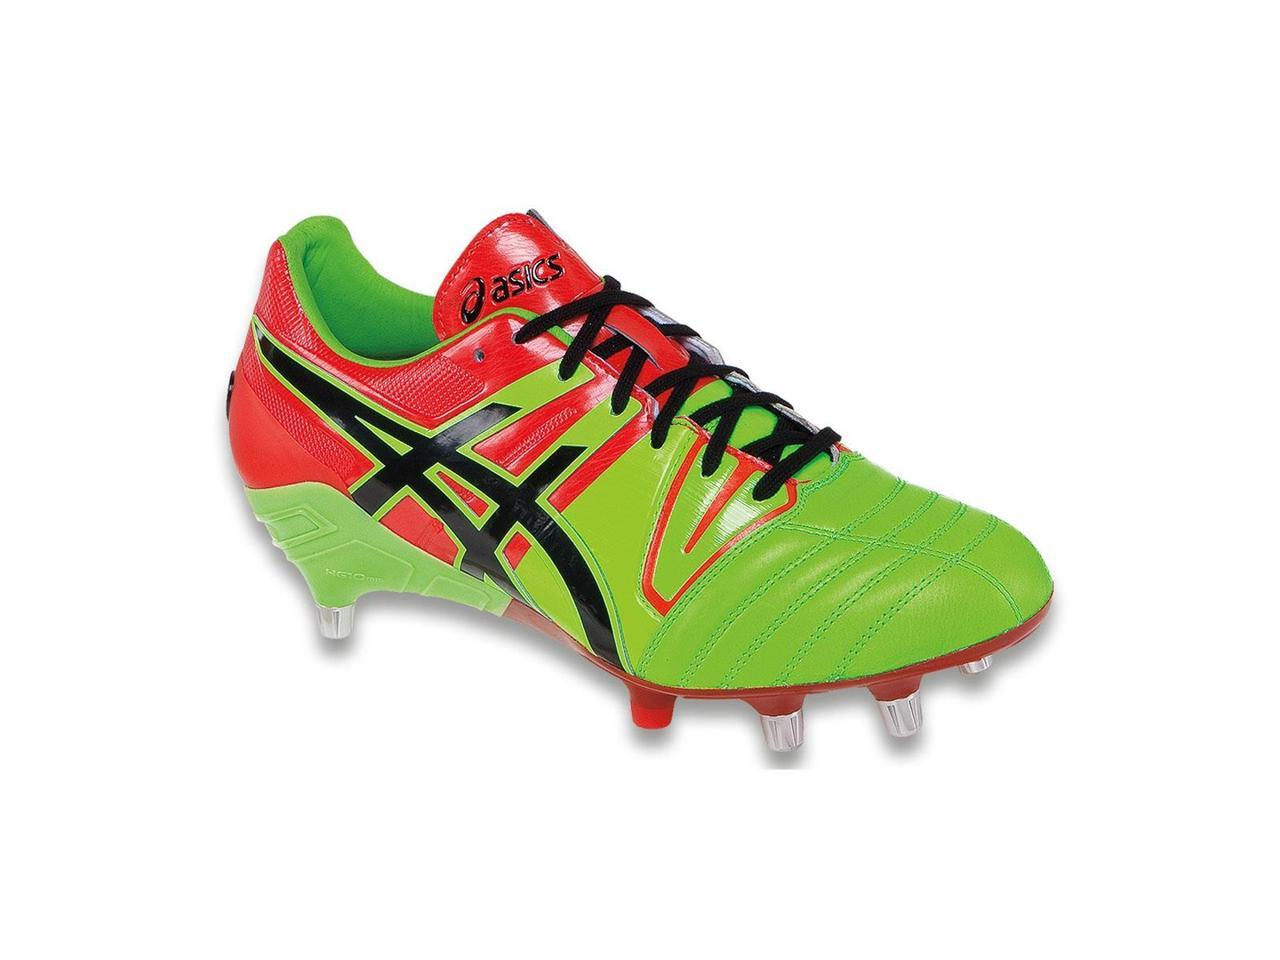 Asics 5 2015/16 Men's Gel-Lethal Tight 5 Asics Rugby Shoe - P500Y.8590 (Flash Green/Black/Deep Orange - 10) 905403